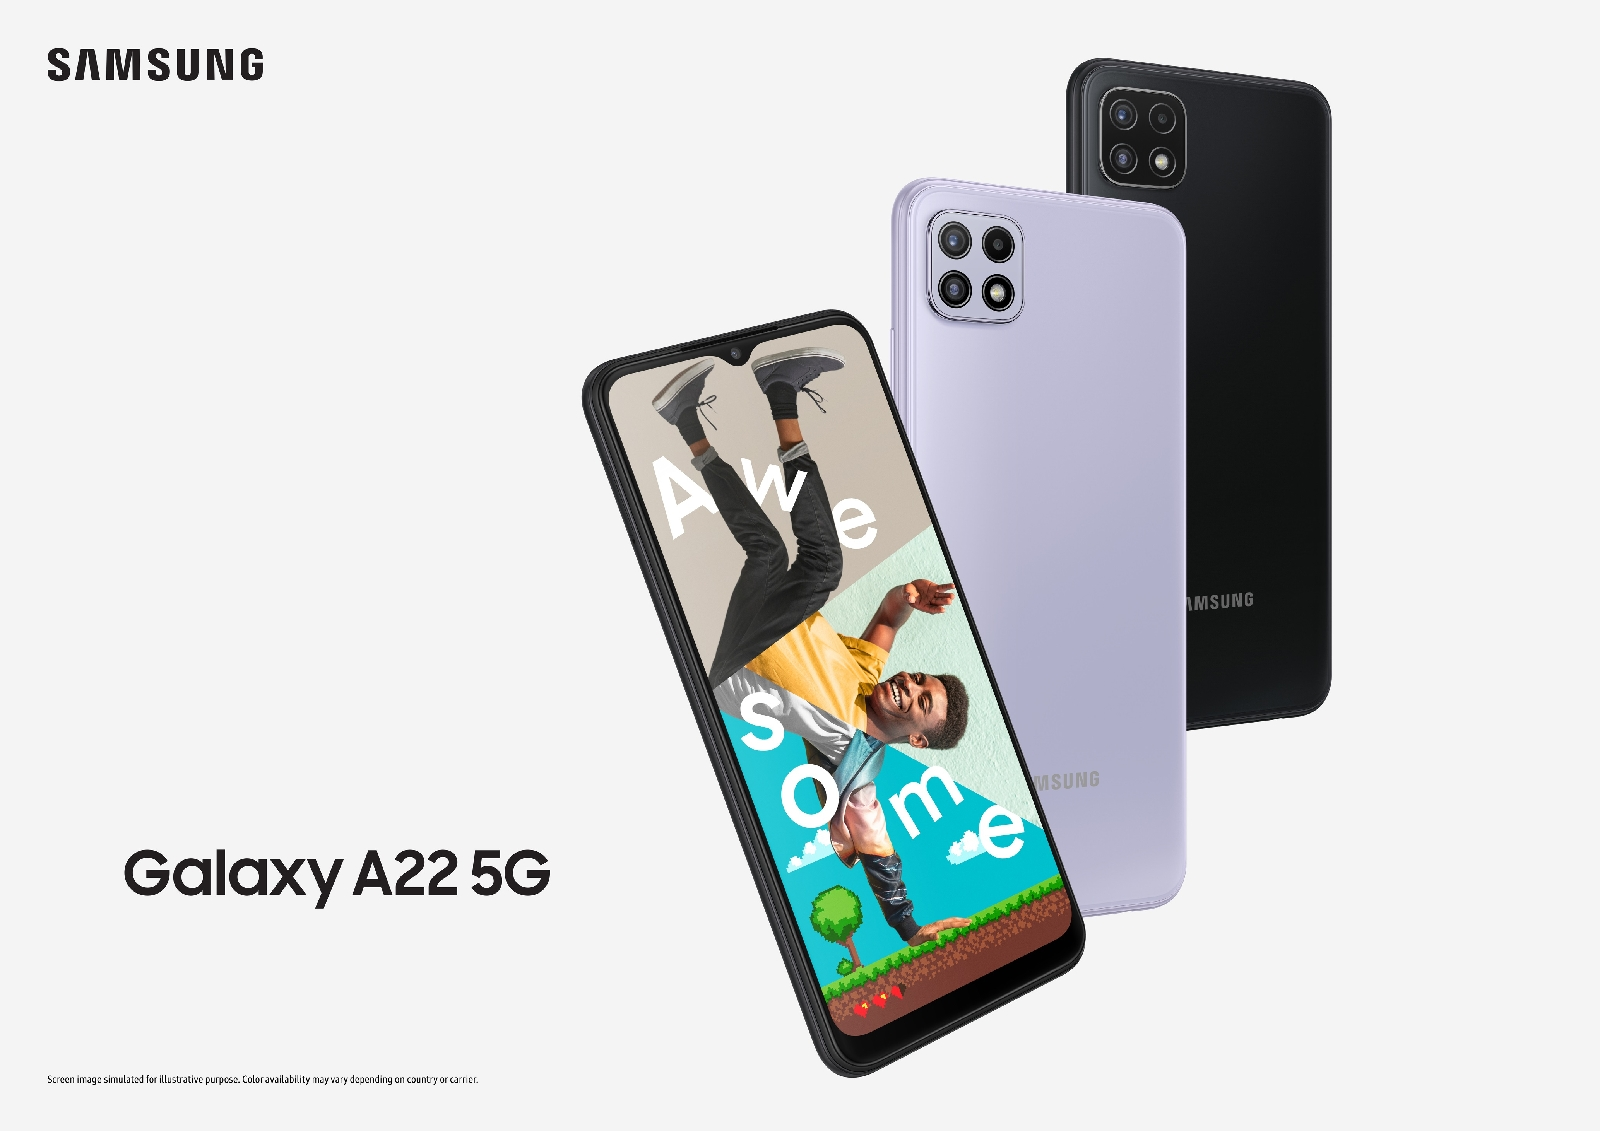 SAMSUNG เปิดตัว Galaxy A22 5G สุดยอดสมาร์ทโฟน 5G เร็วเต็มสปีดรุ่นใหม่ล่าสุดในราคาเริ่มต้นเพียง 1,289 บาท! ที่ร้านค้าในเครือ AIS เท่านั้น